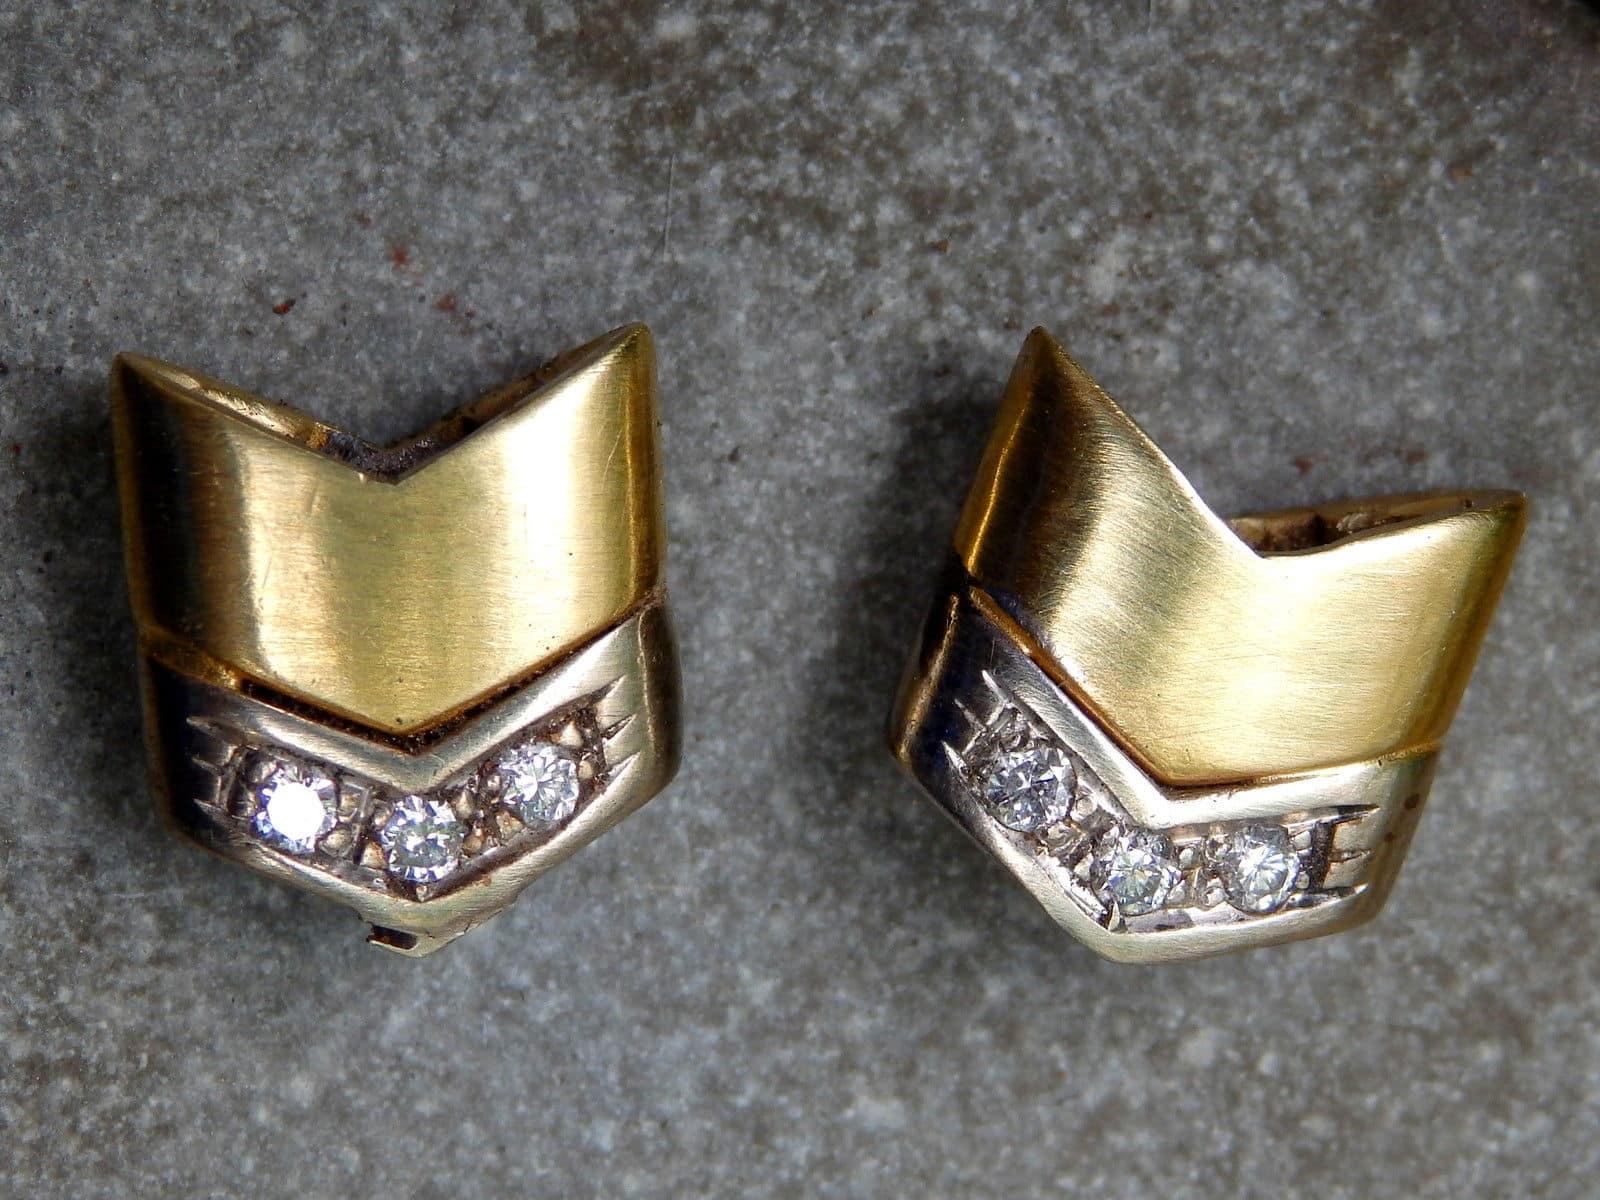 Unikat Ohrstecker Gold 750 Weissgold 750 Brillant